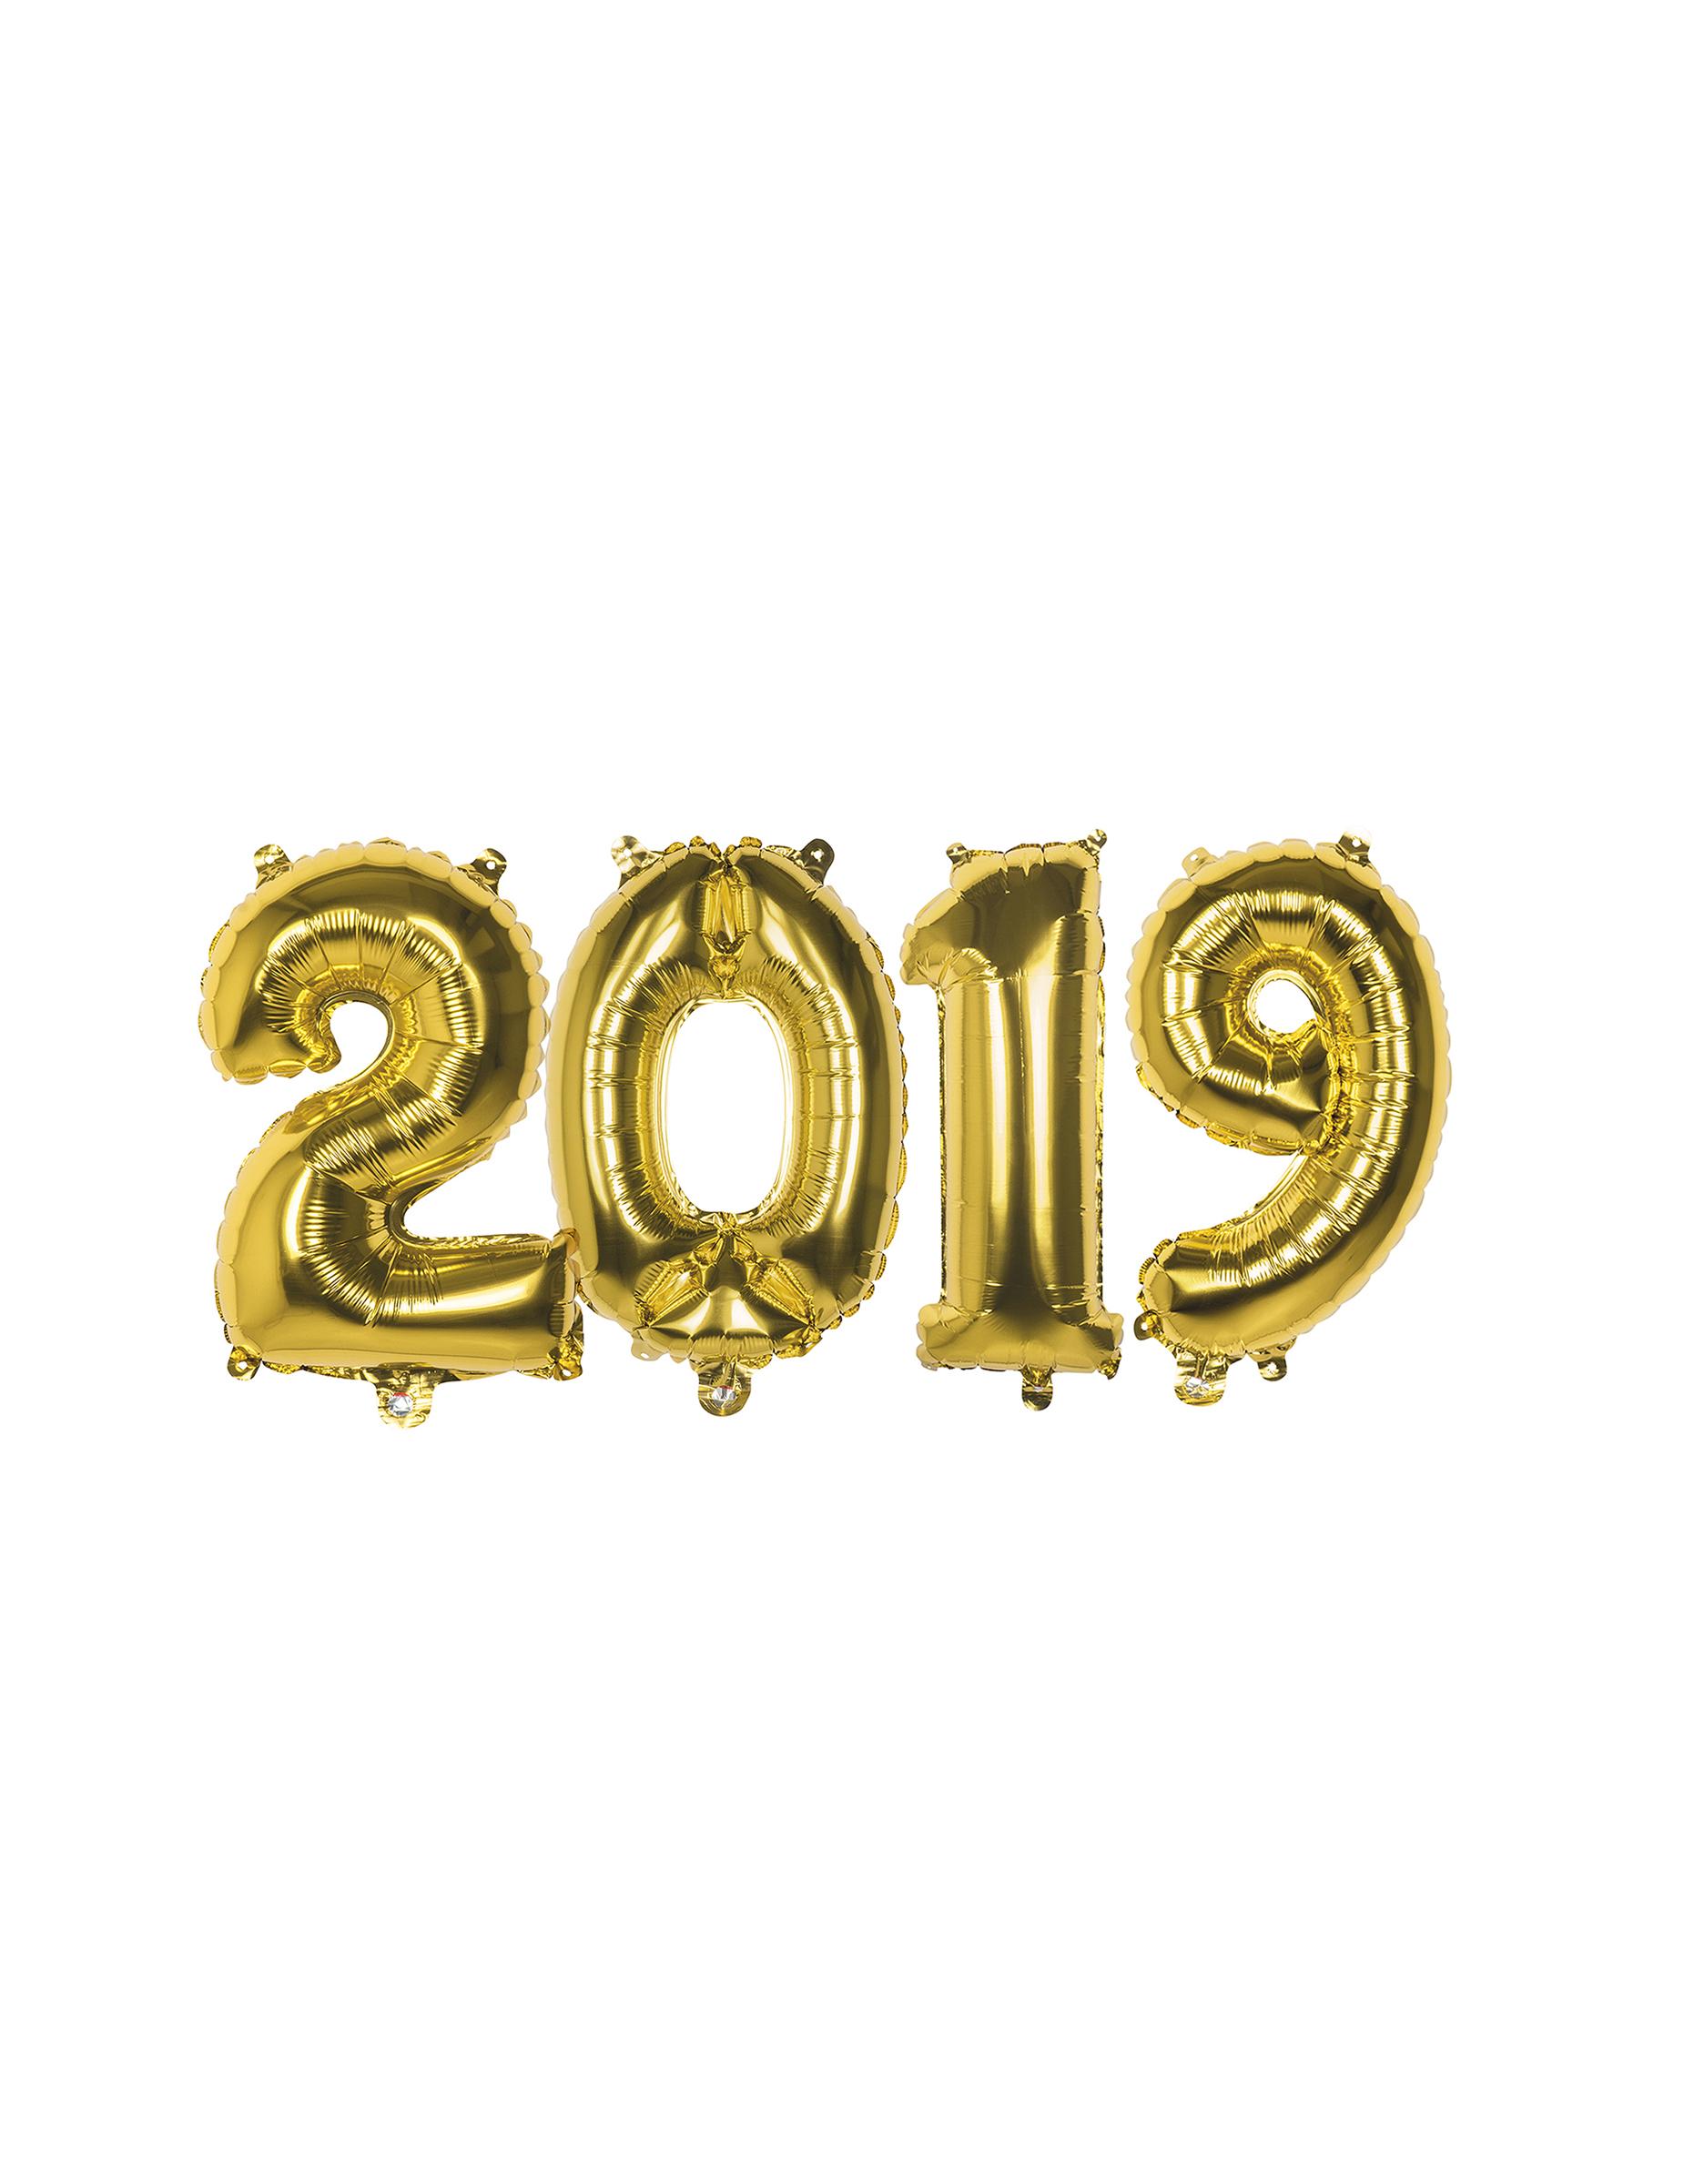 silvester aluminiumballons 2019 party deko 4 st ck gold 36cm g nstige faschings partydeko. Black Bedroom Furniture Sets. Home Design Ideas